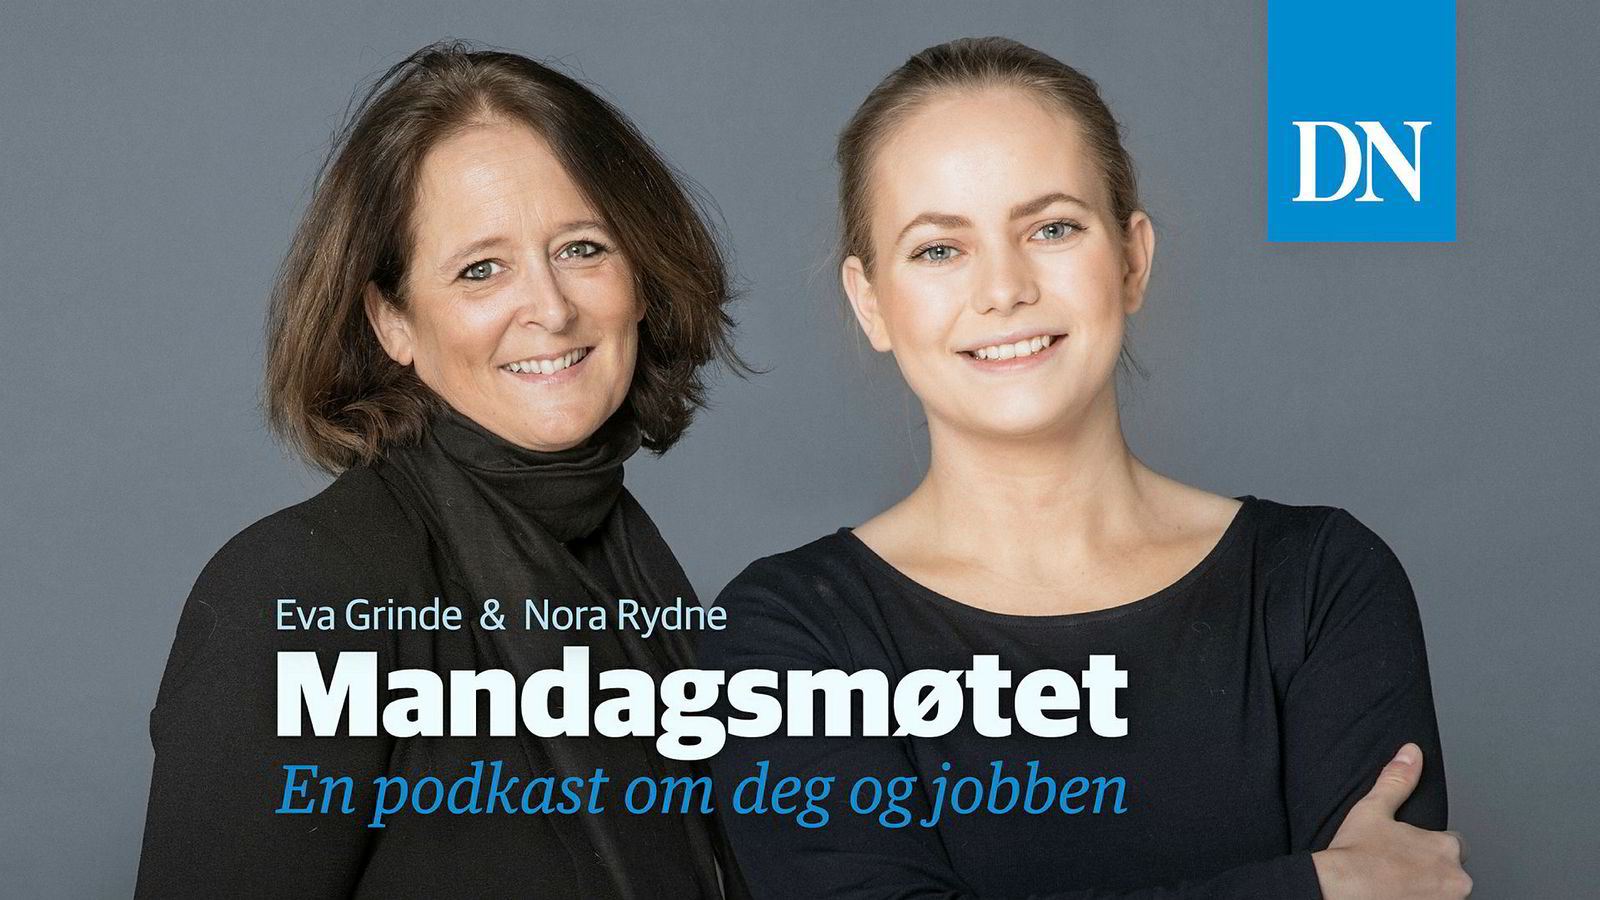 Logo til Dagens Næringsliv sin podkast Mandagsmøtet med Eva Grinde og Nora Rydne